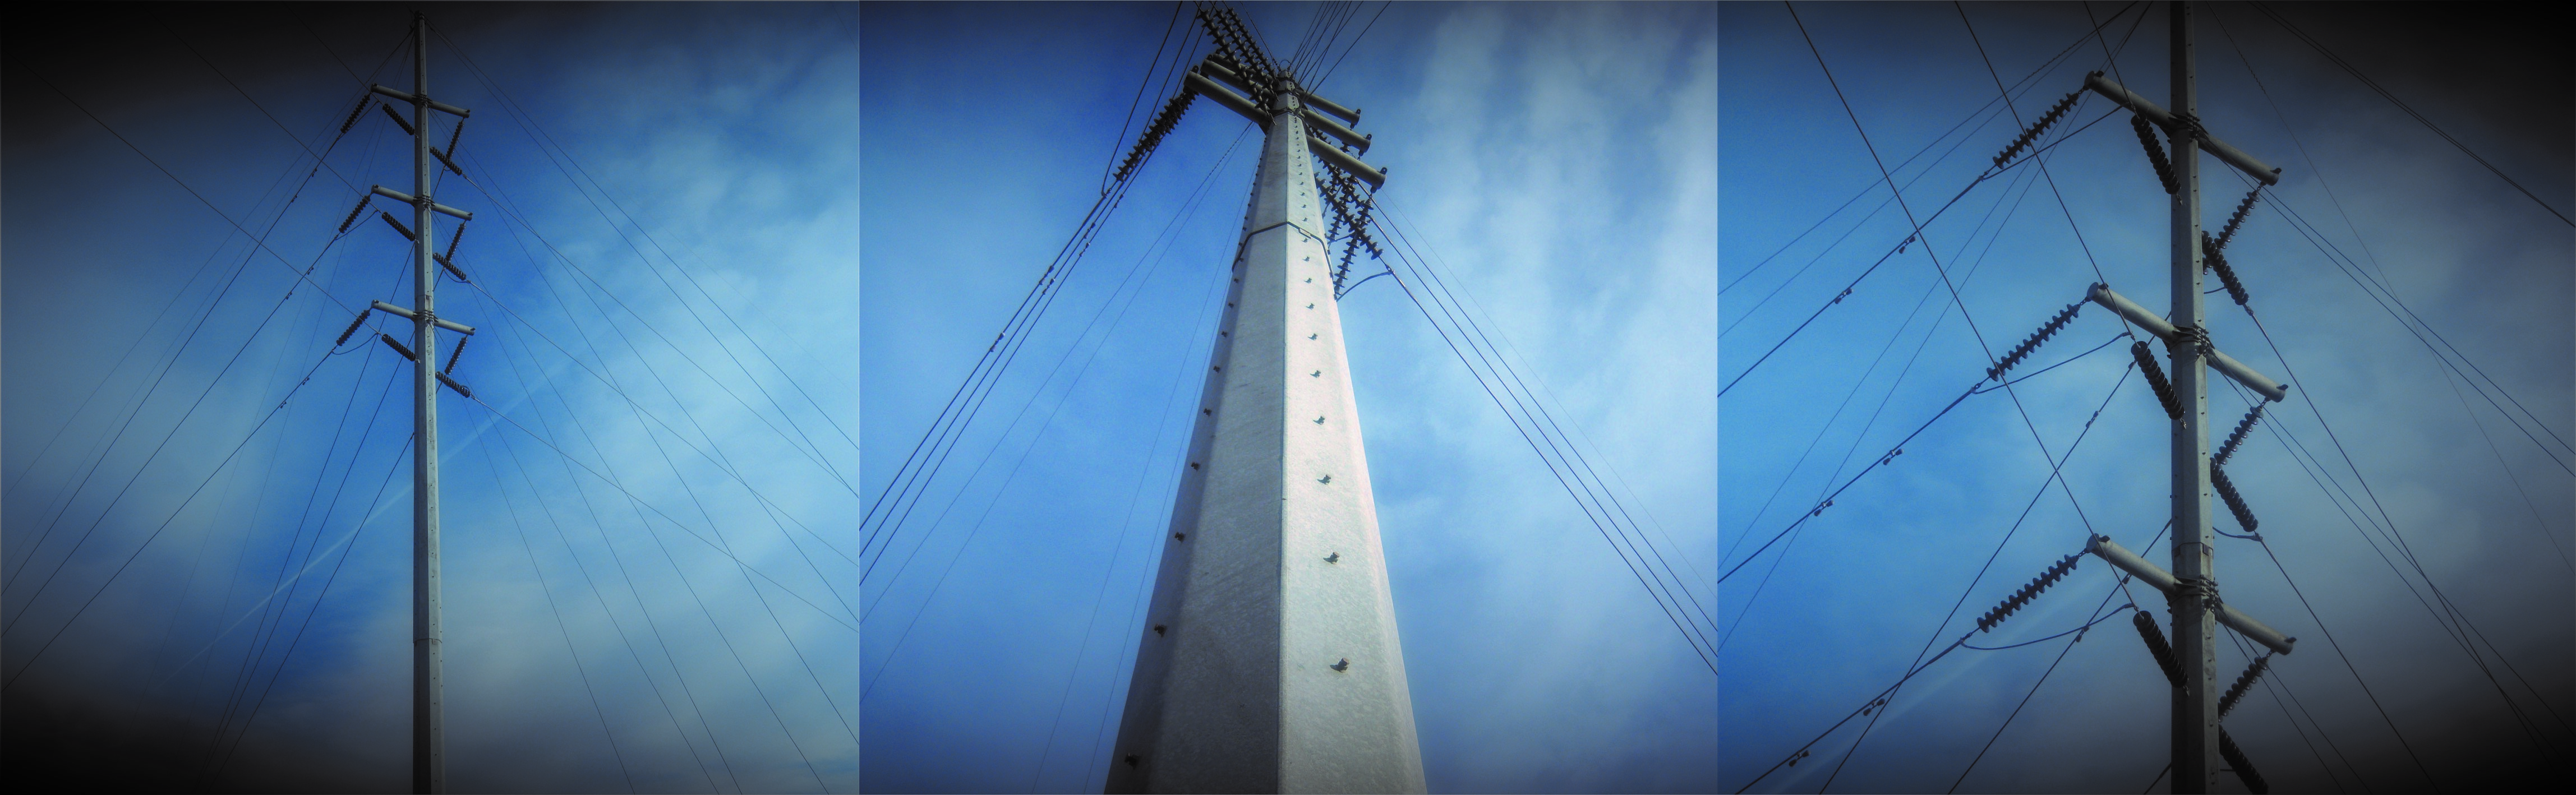 Galvanized Transmission Tower